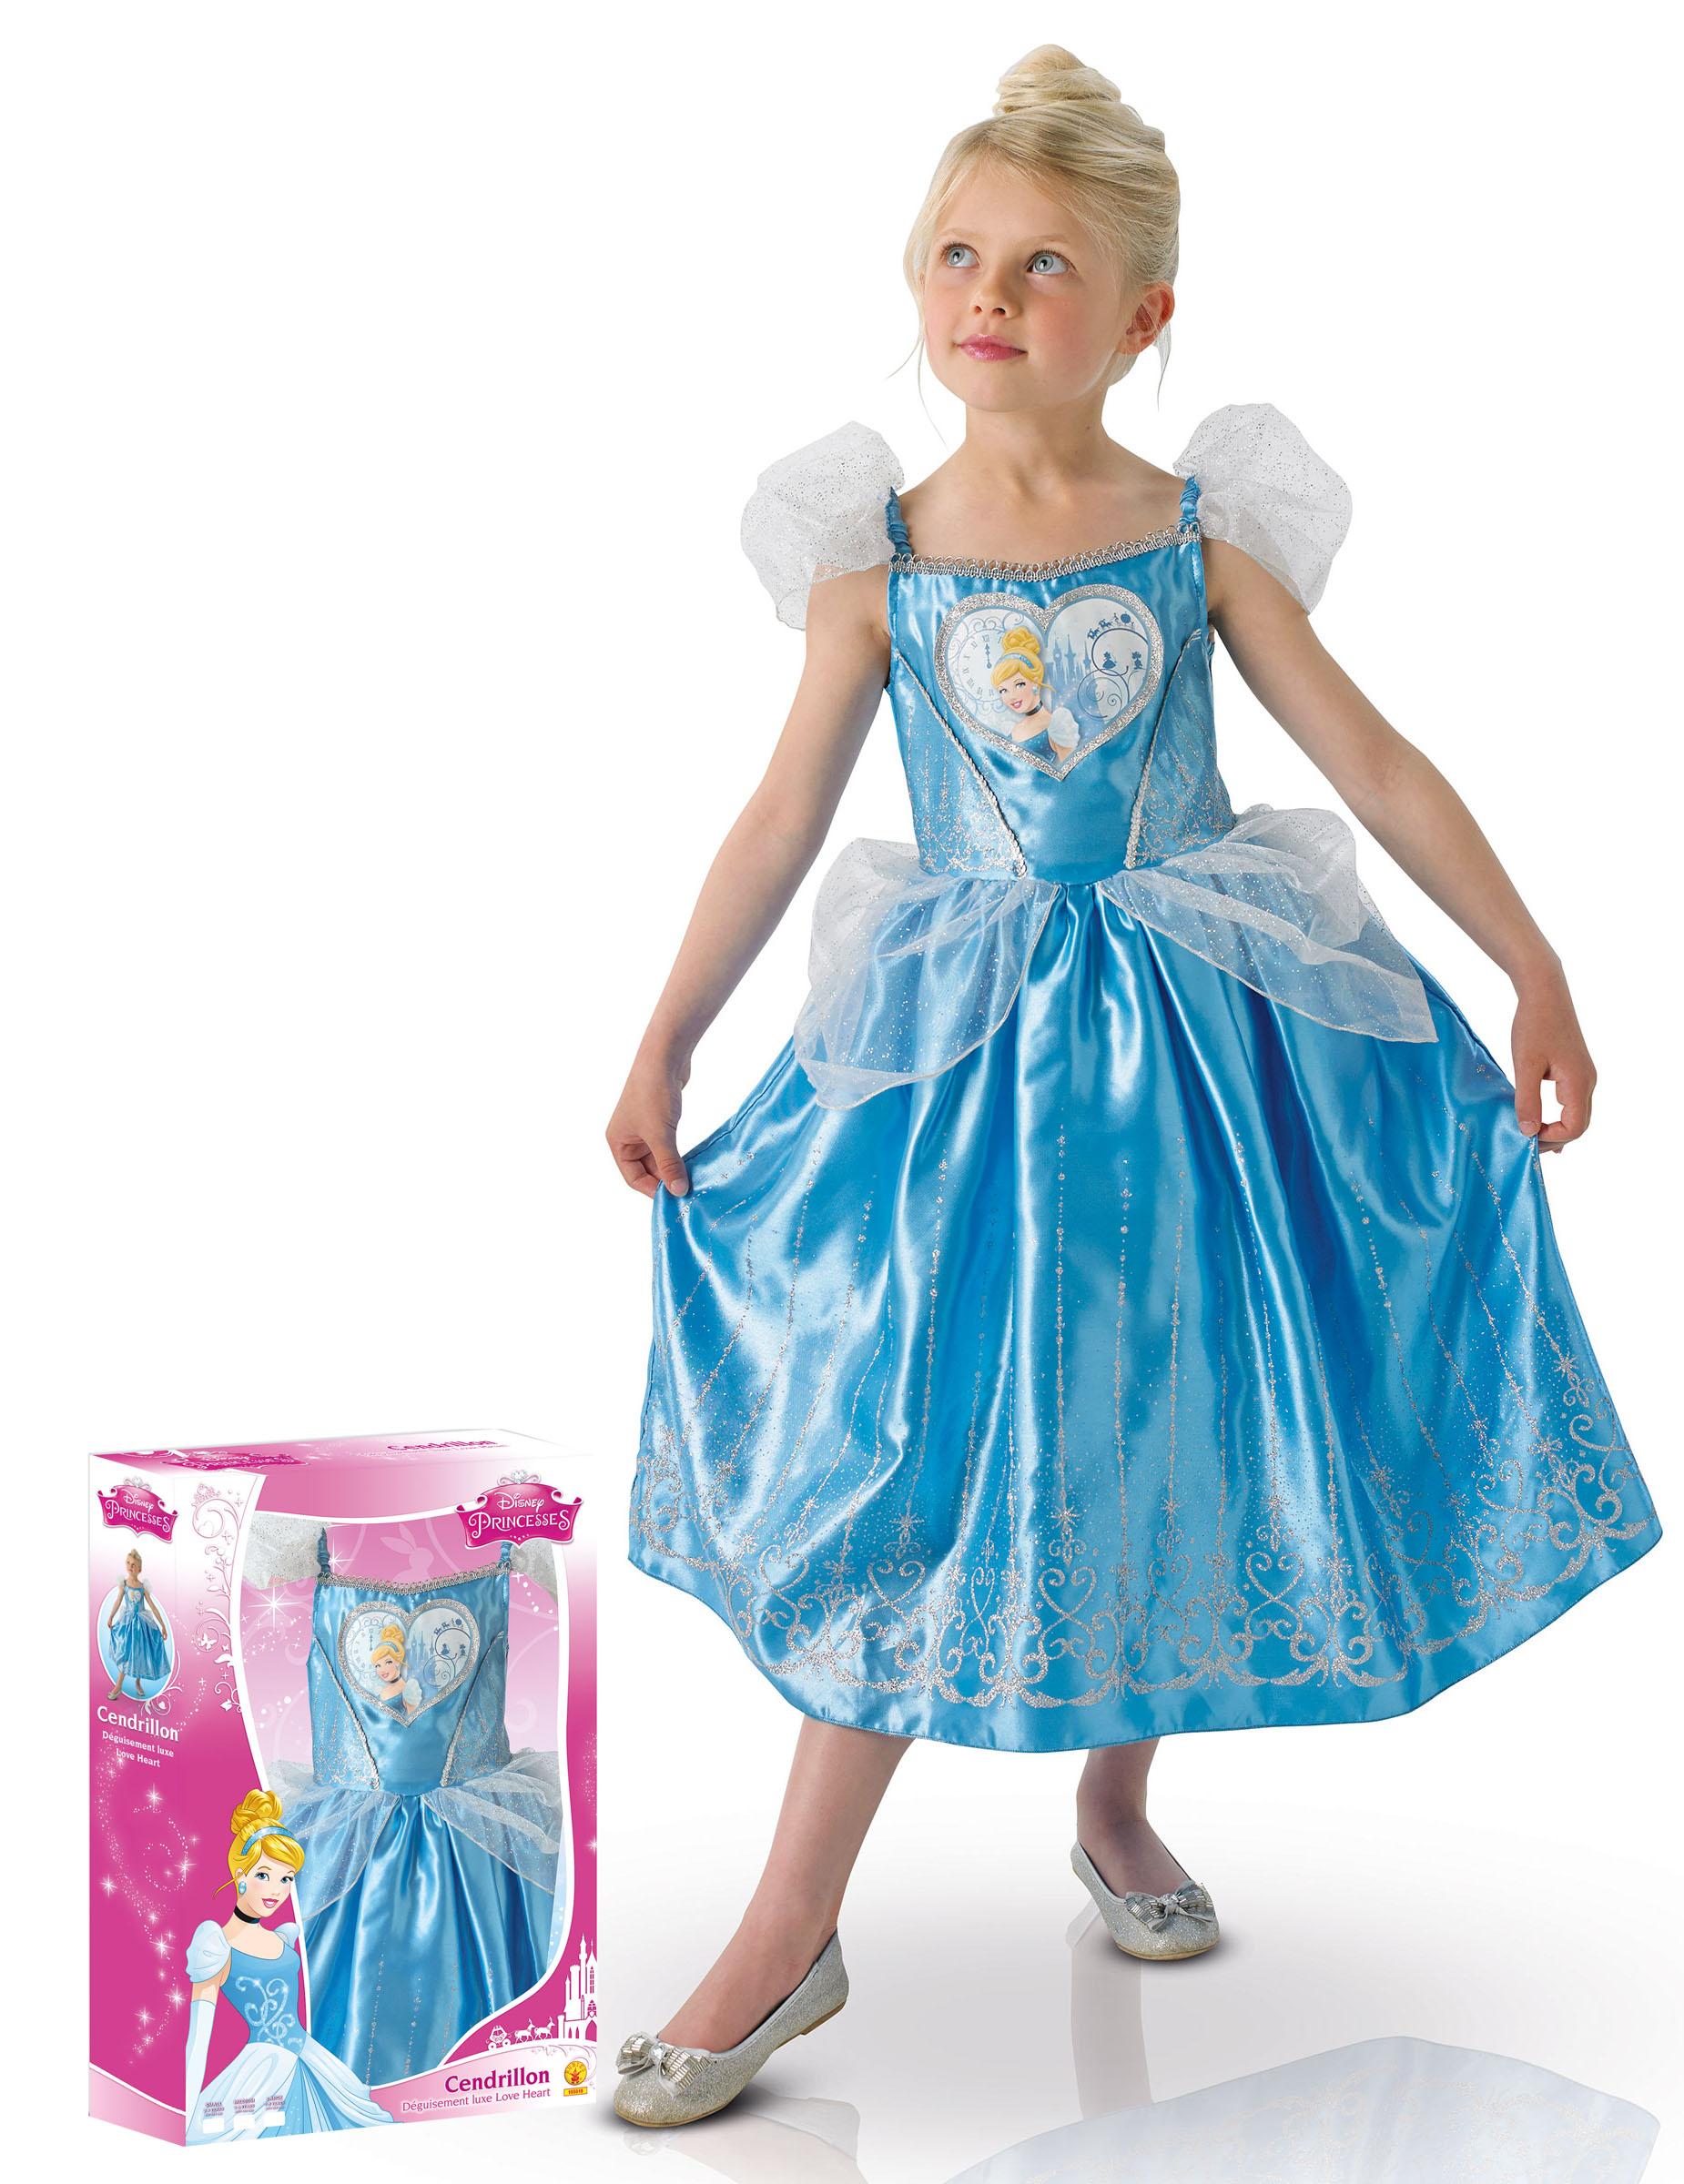 7ef358faeae7 Kostume luksus Love heart Askepot™ piger gaveindpakning